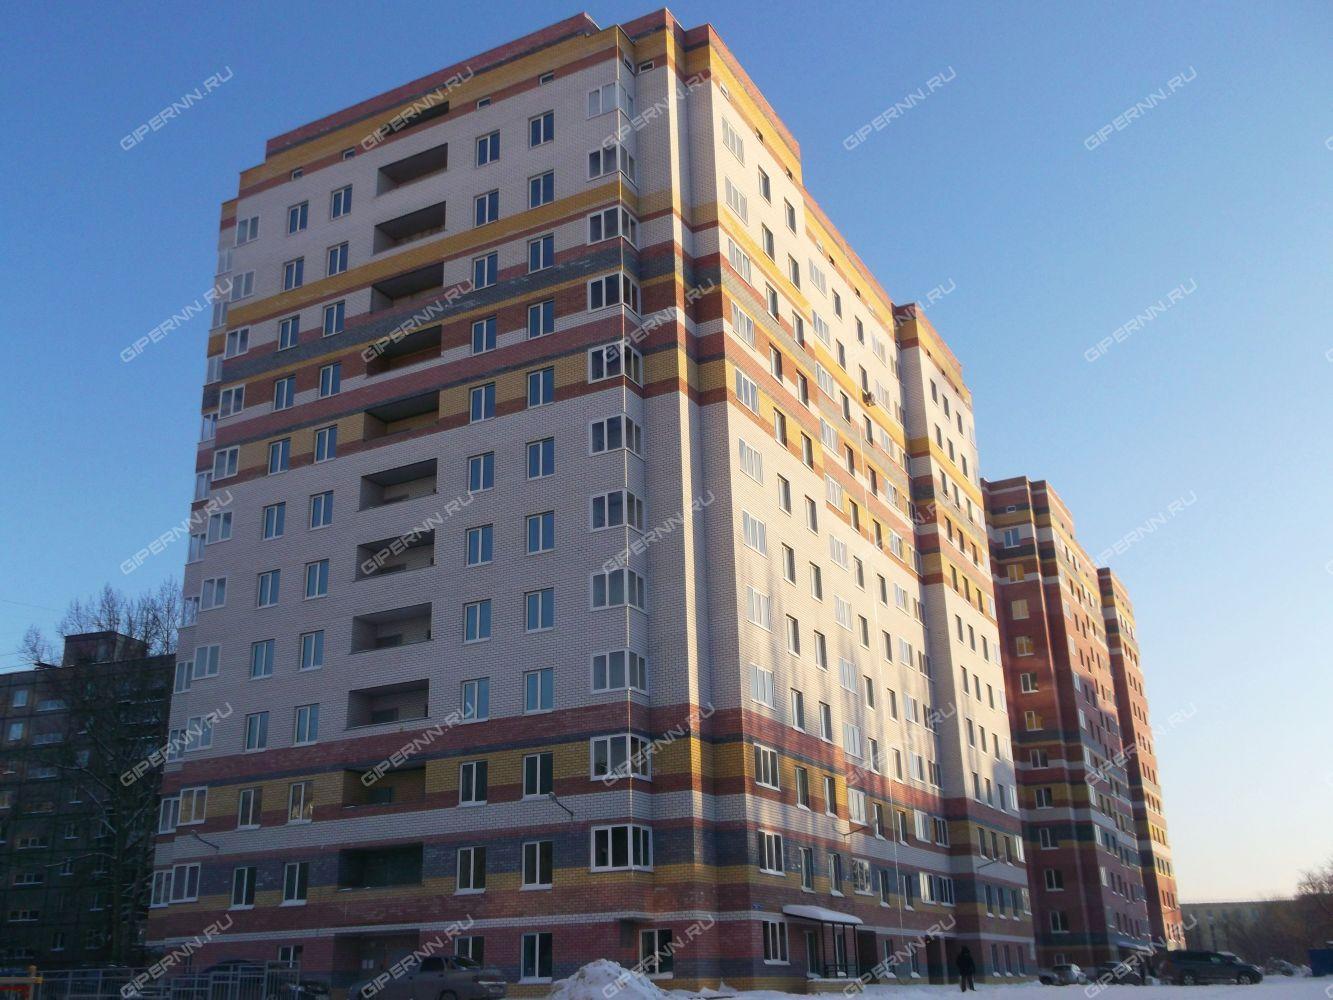 План двухкомнатной квартиры дома серии II-49 до